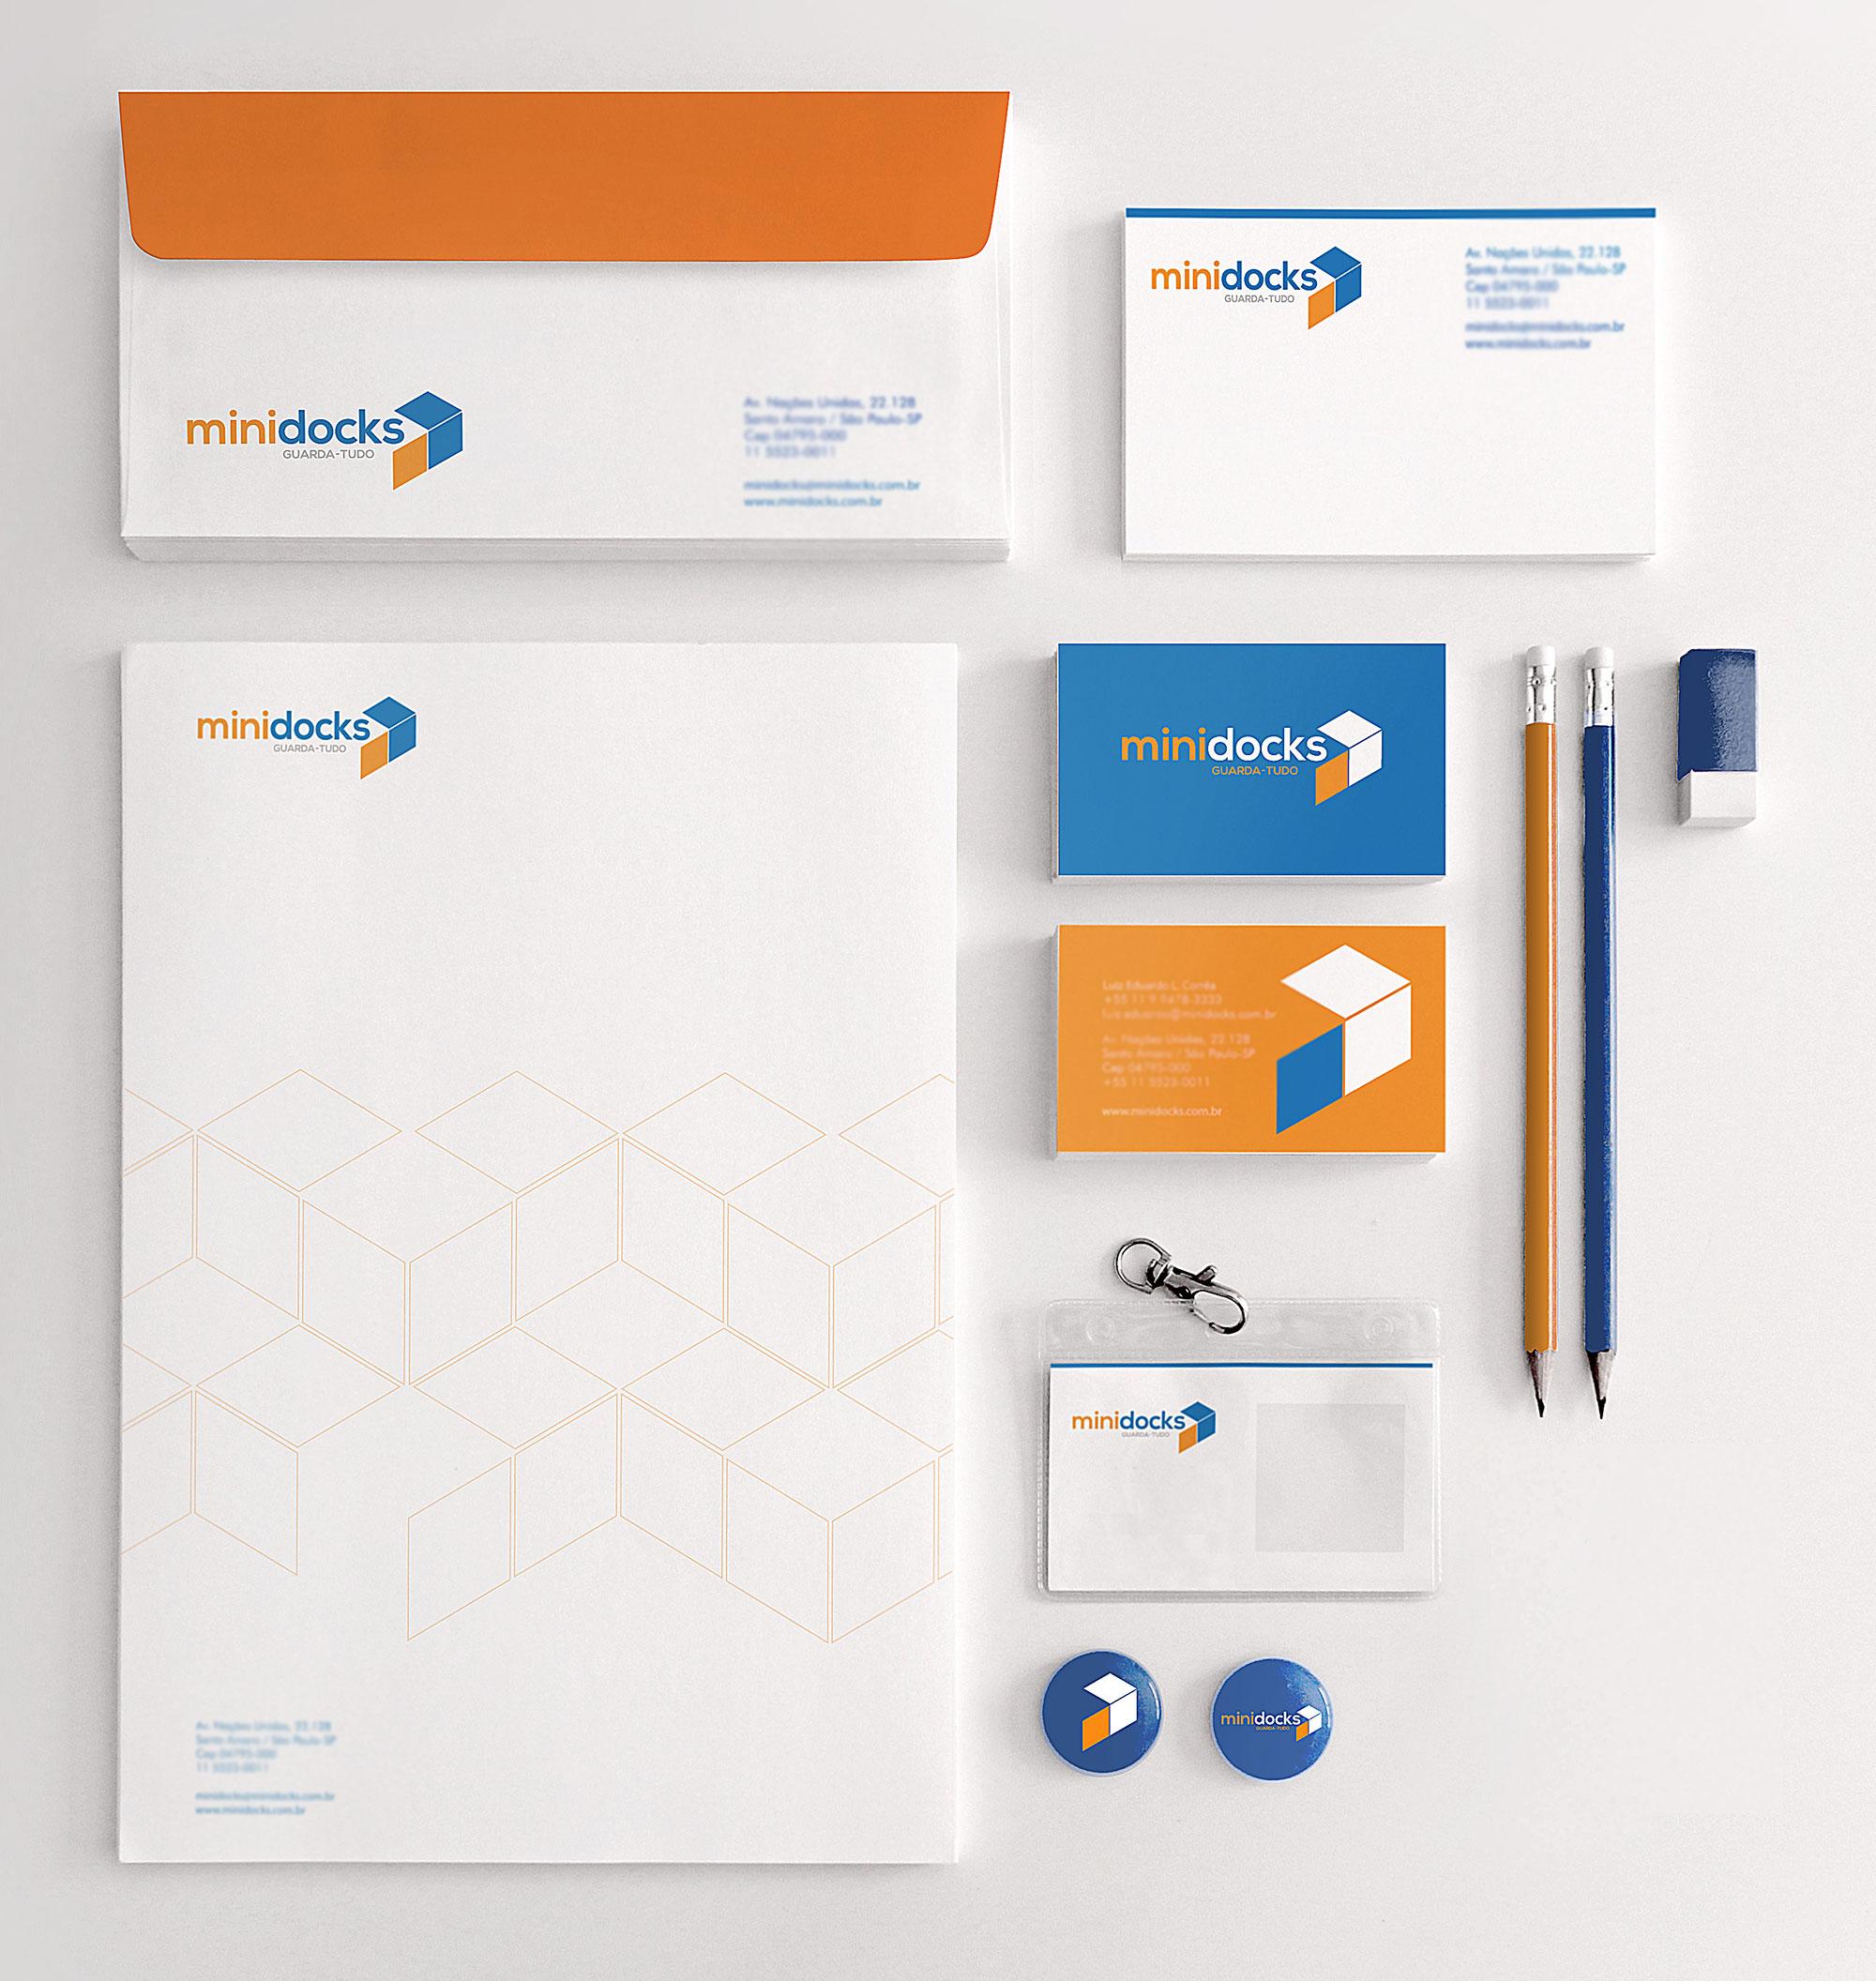 design repositioning brand